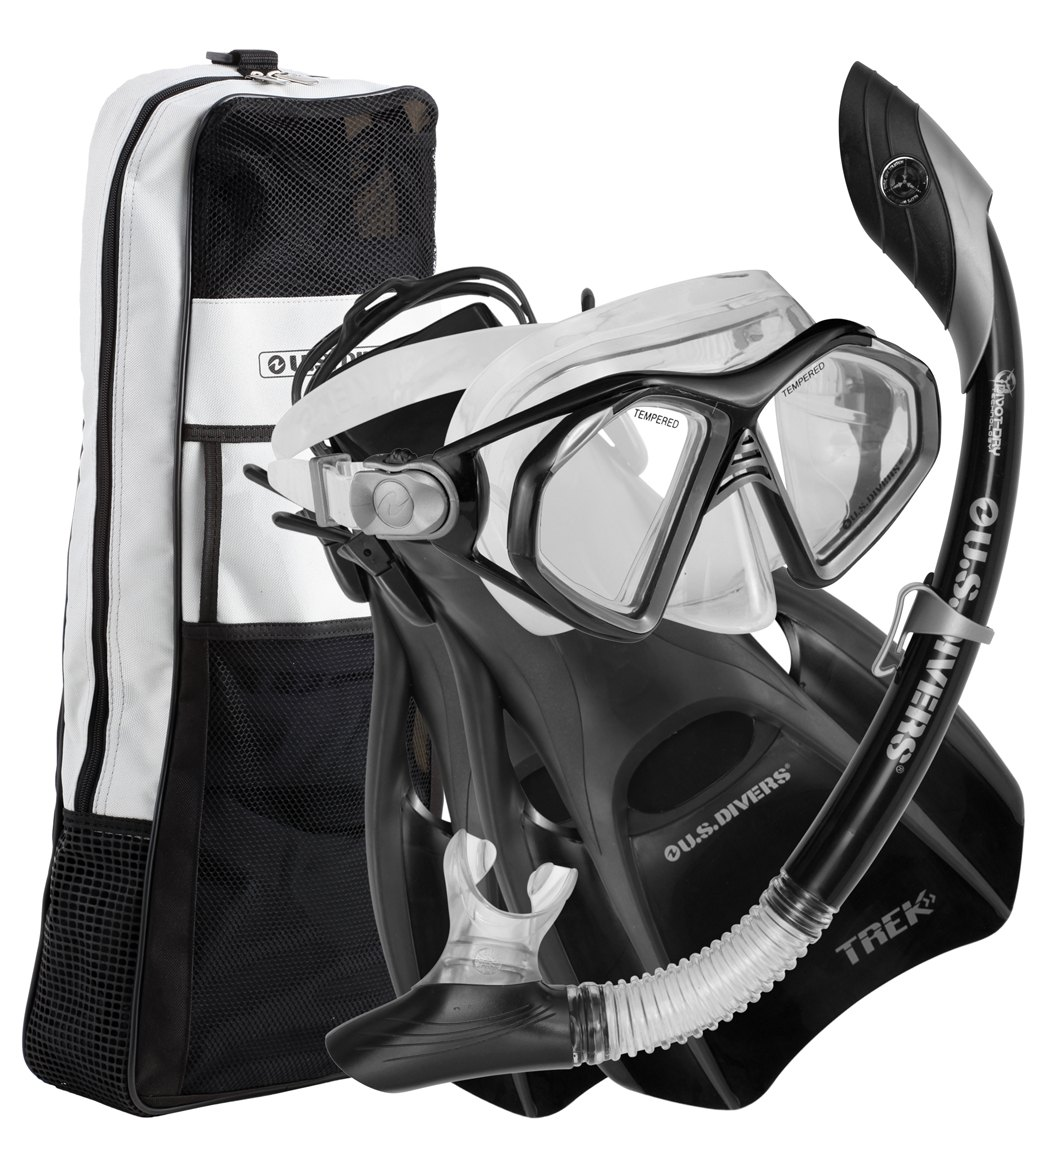 u s divers admiral lx island dry trek travel bag mask snorkel and